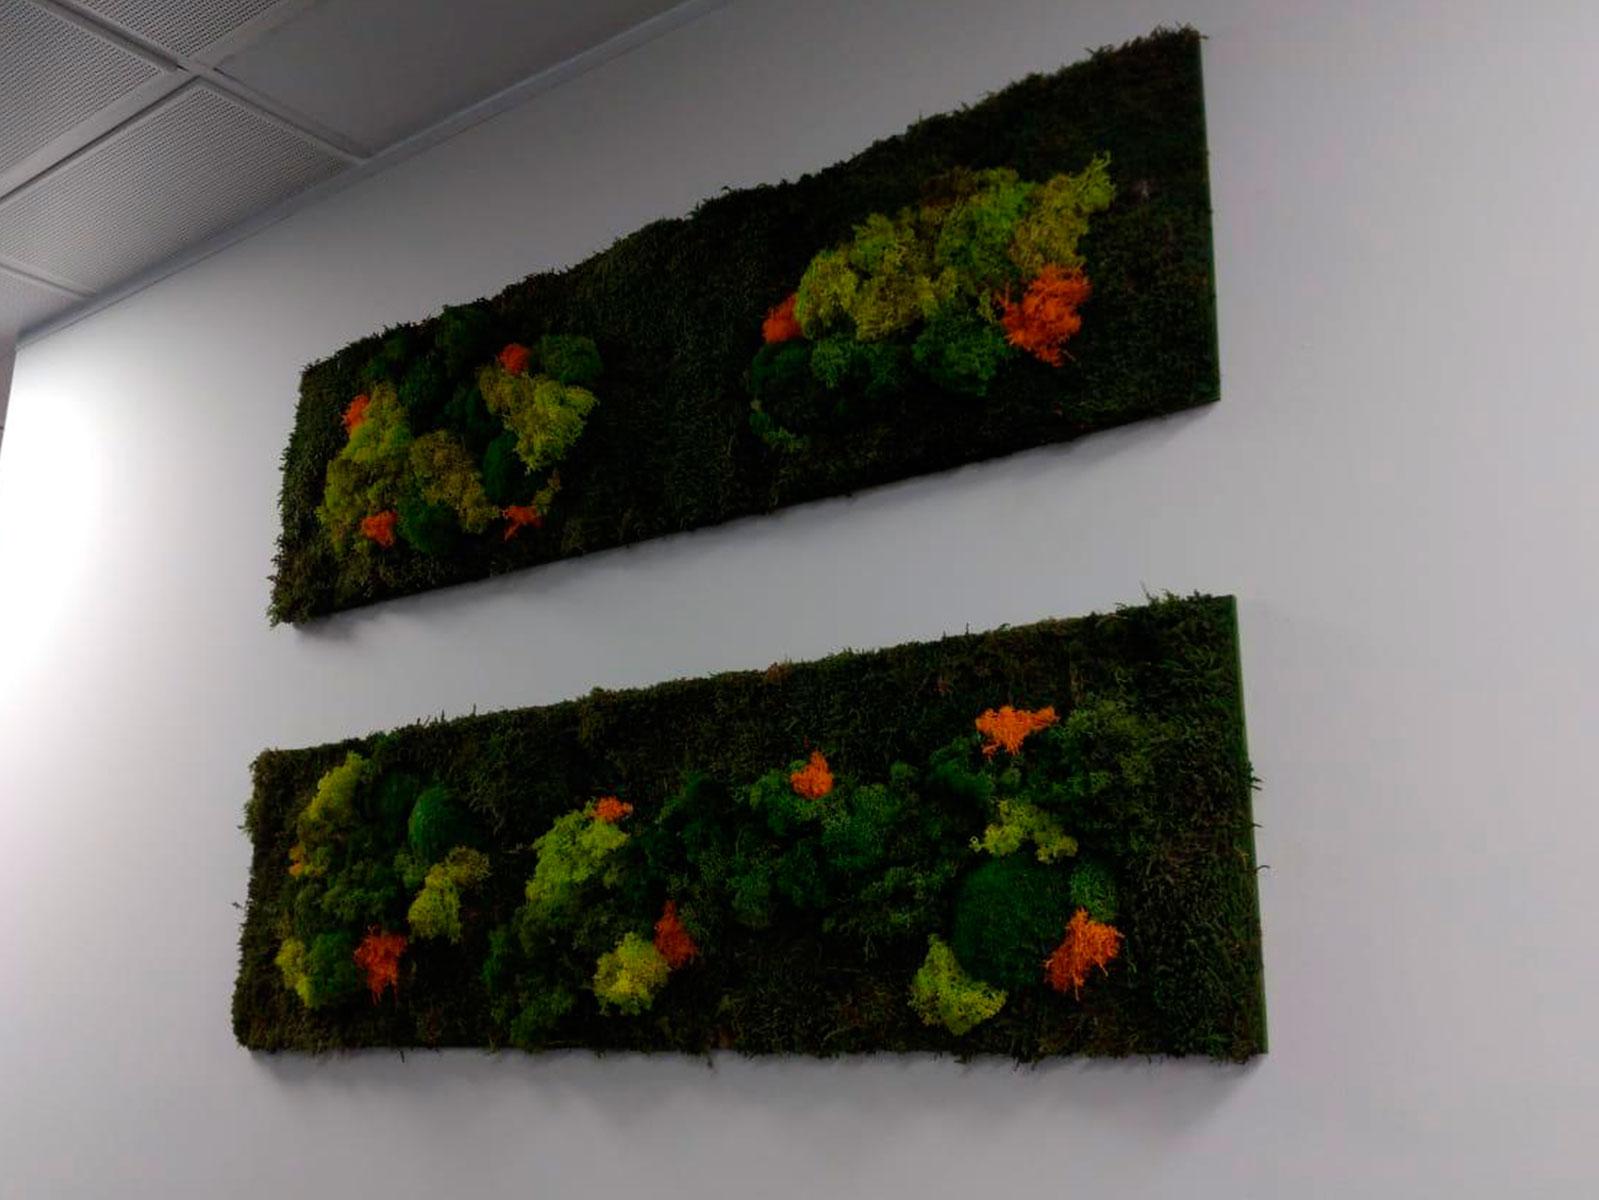 jardin-vertical-en-alcobendas-1